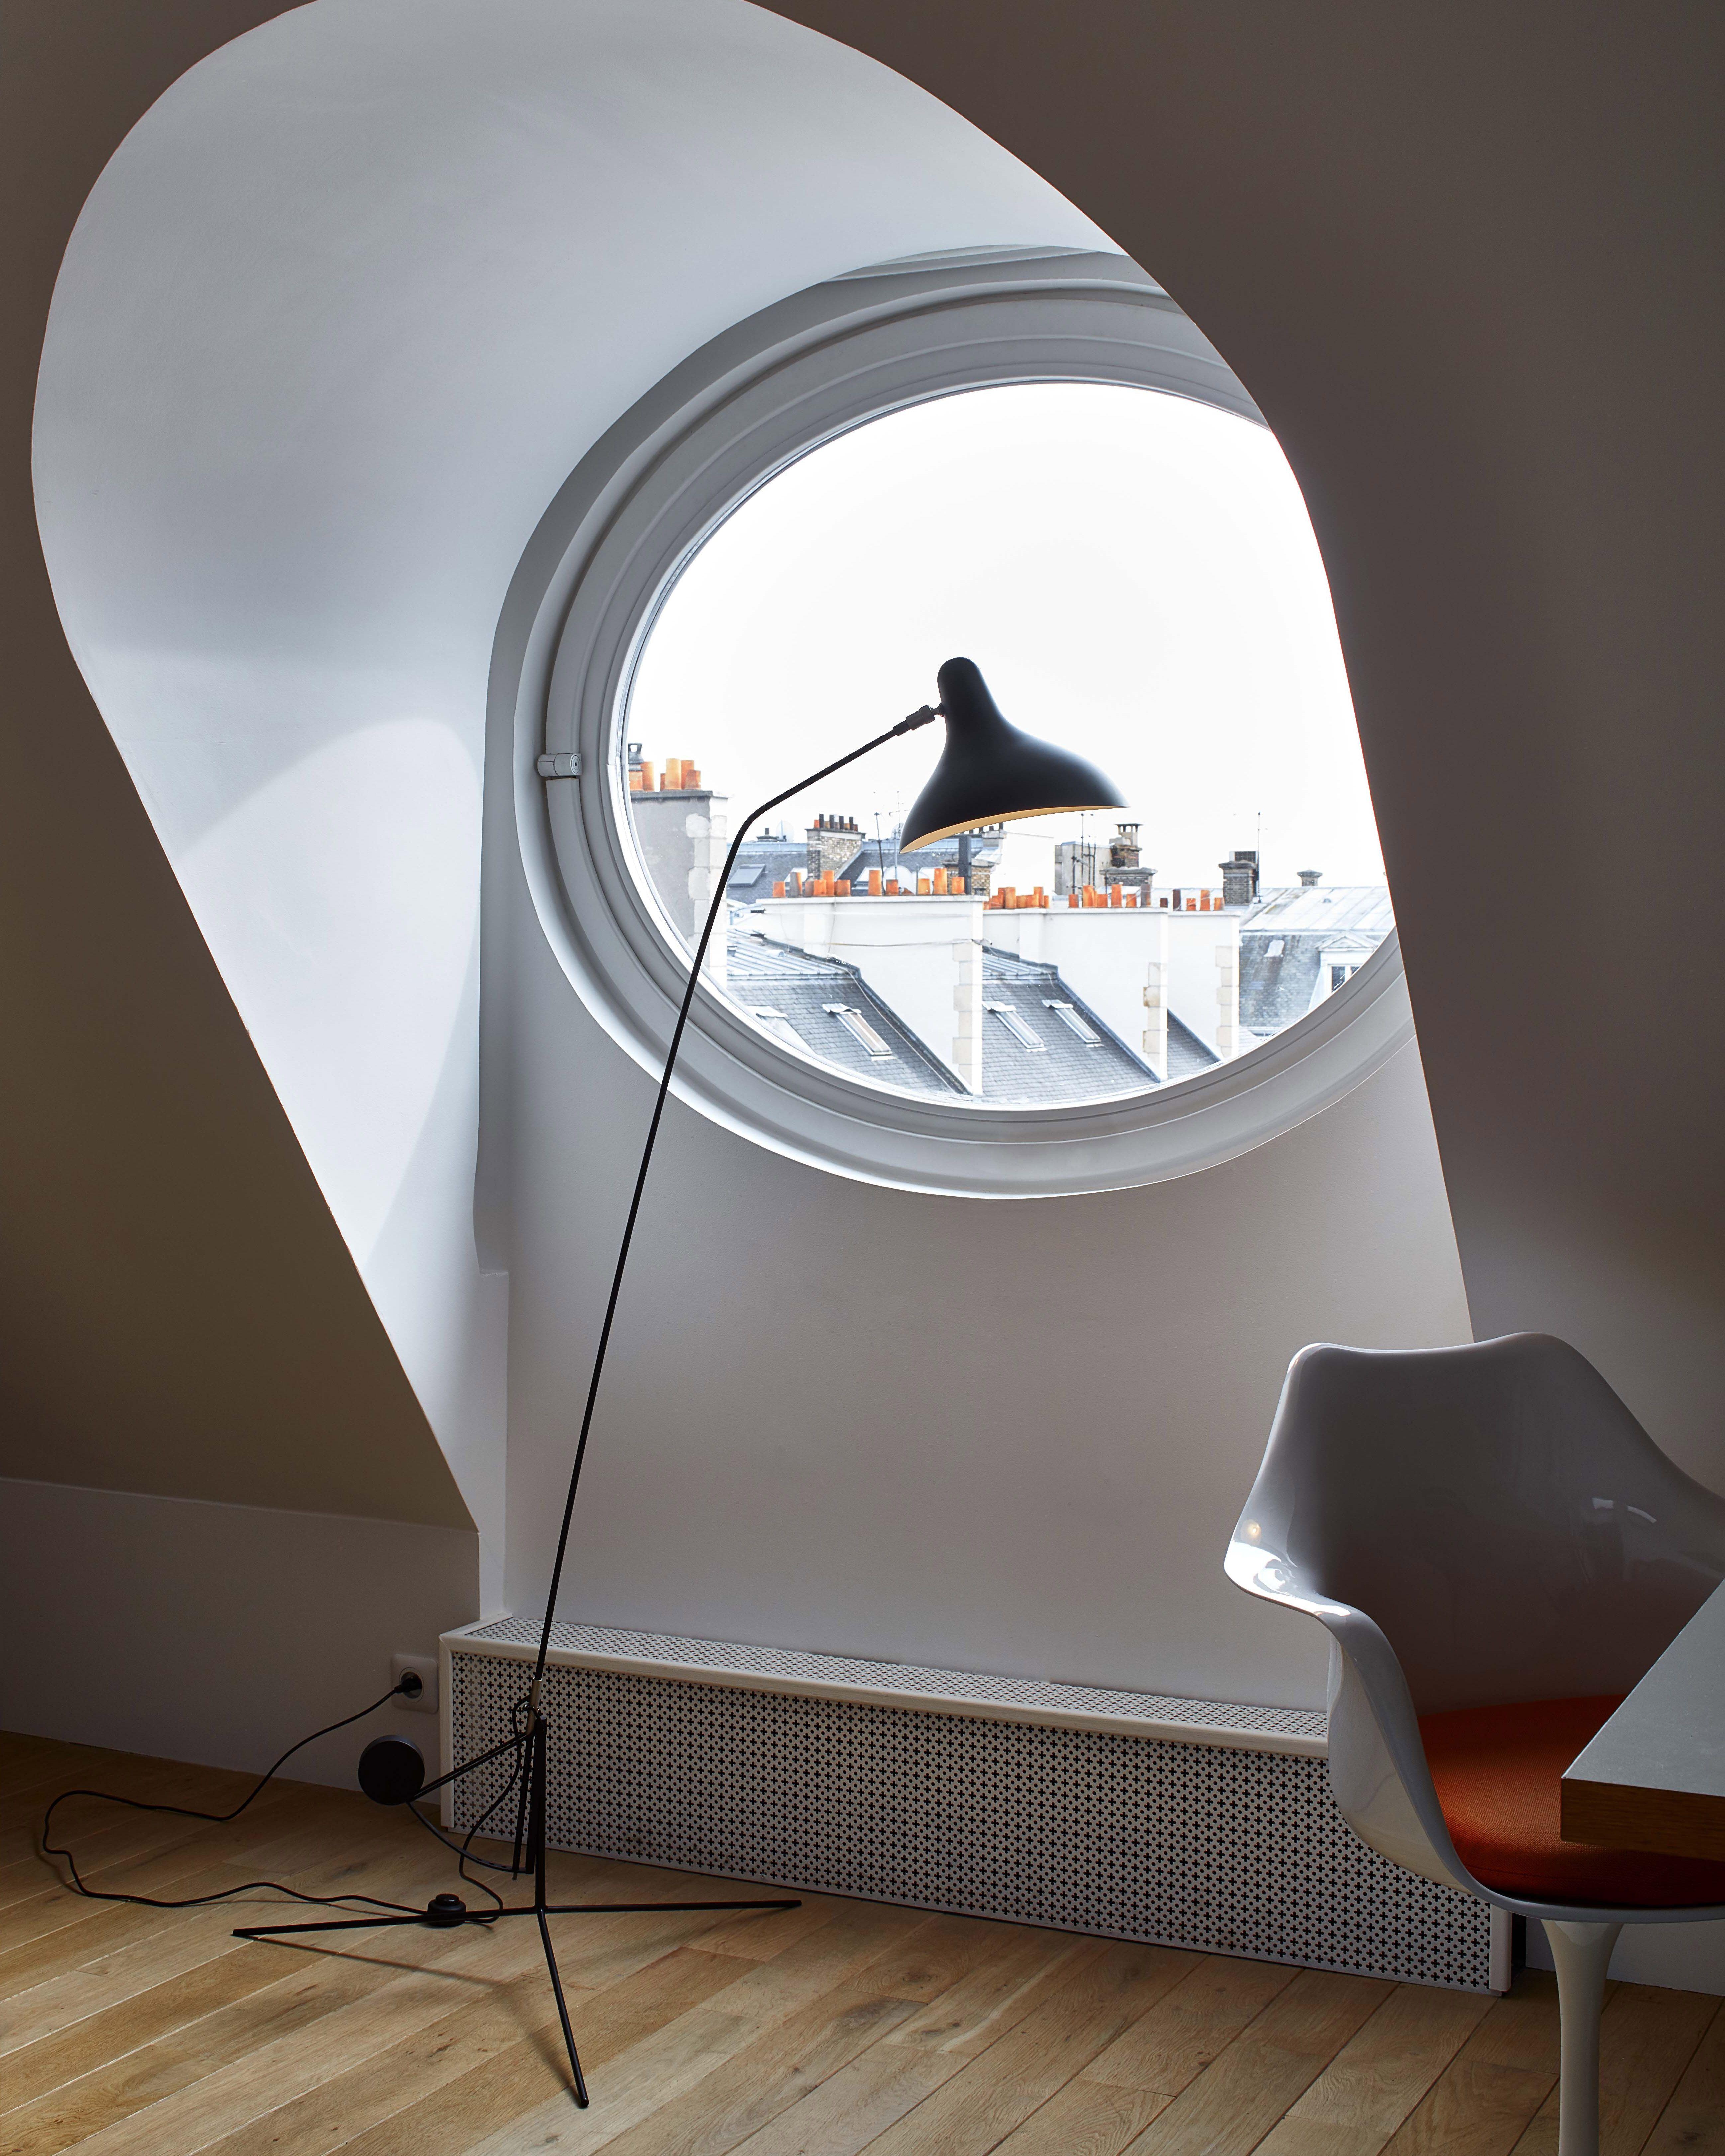 MANTIS designed by Bernard Schottlander, edited by DCW éditions